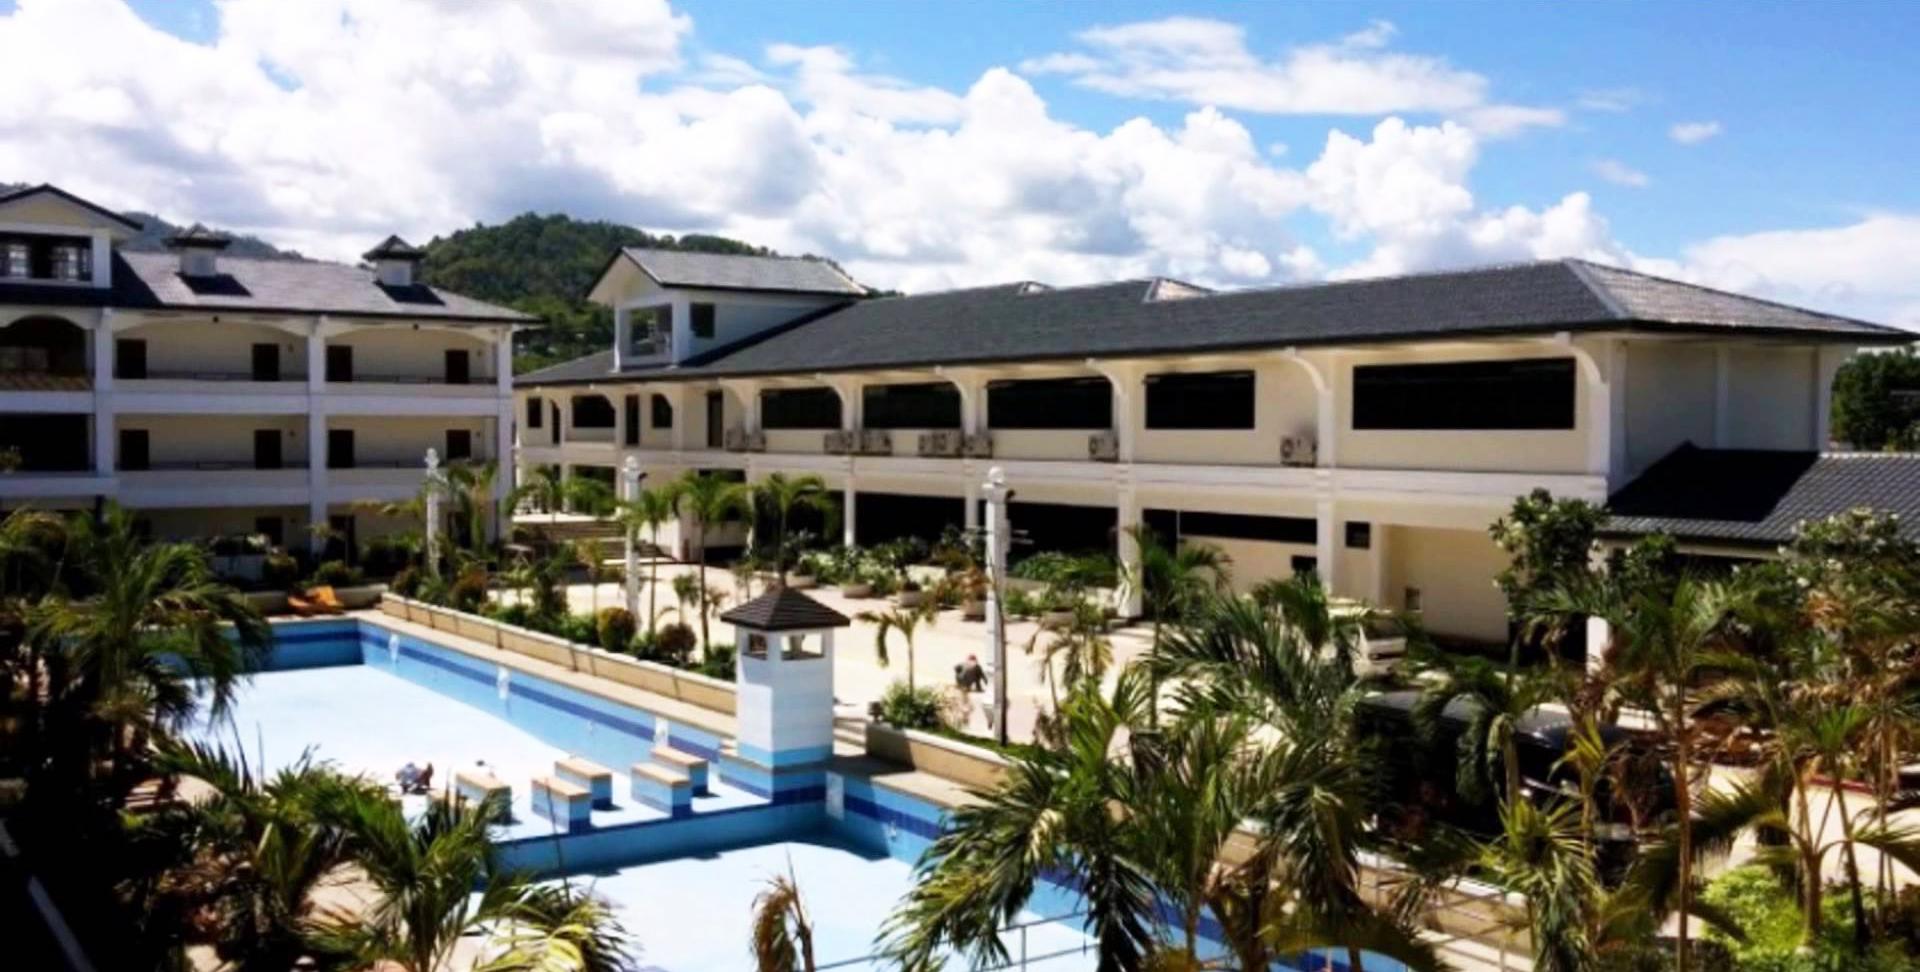 Trường Anh ngữ CPI, Cebu, Philippines